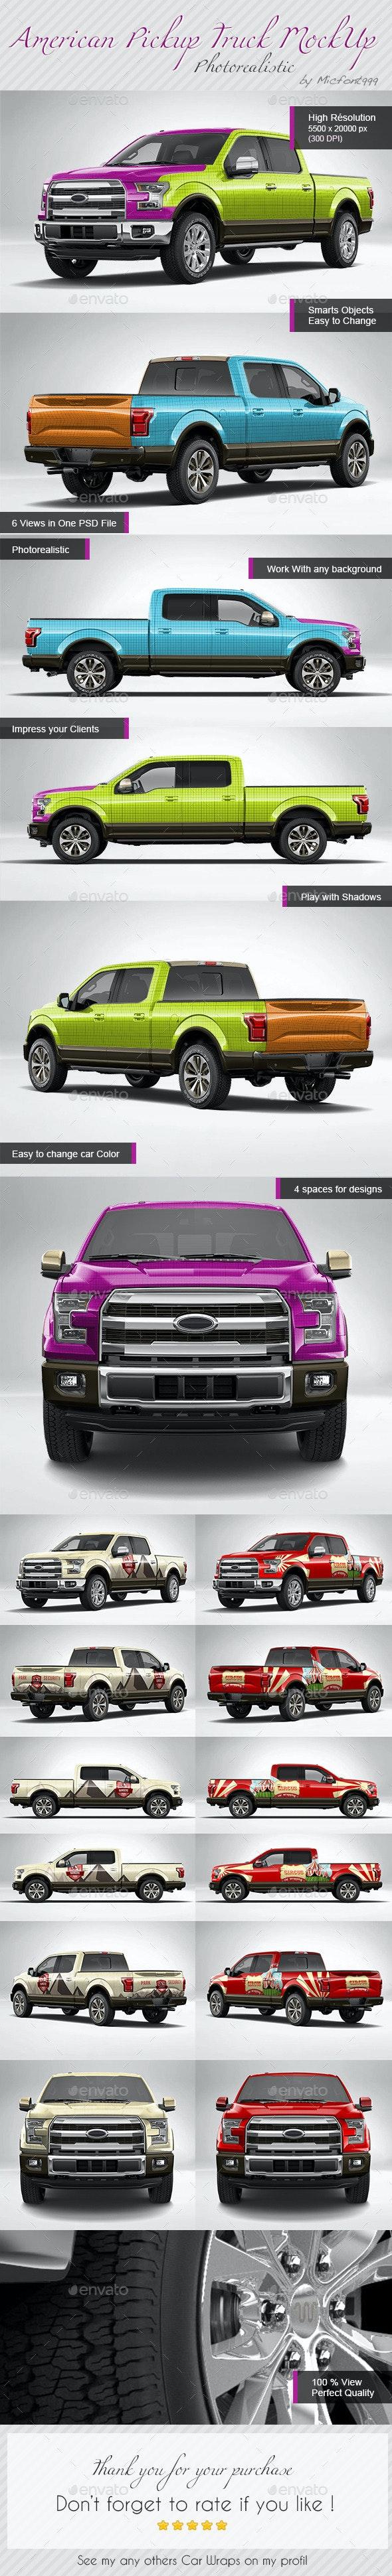 Photorealistic American Pickup Truck Wrap Mock-up - Vehicle Wraps Print